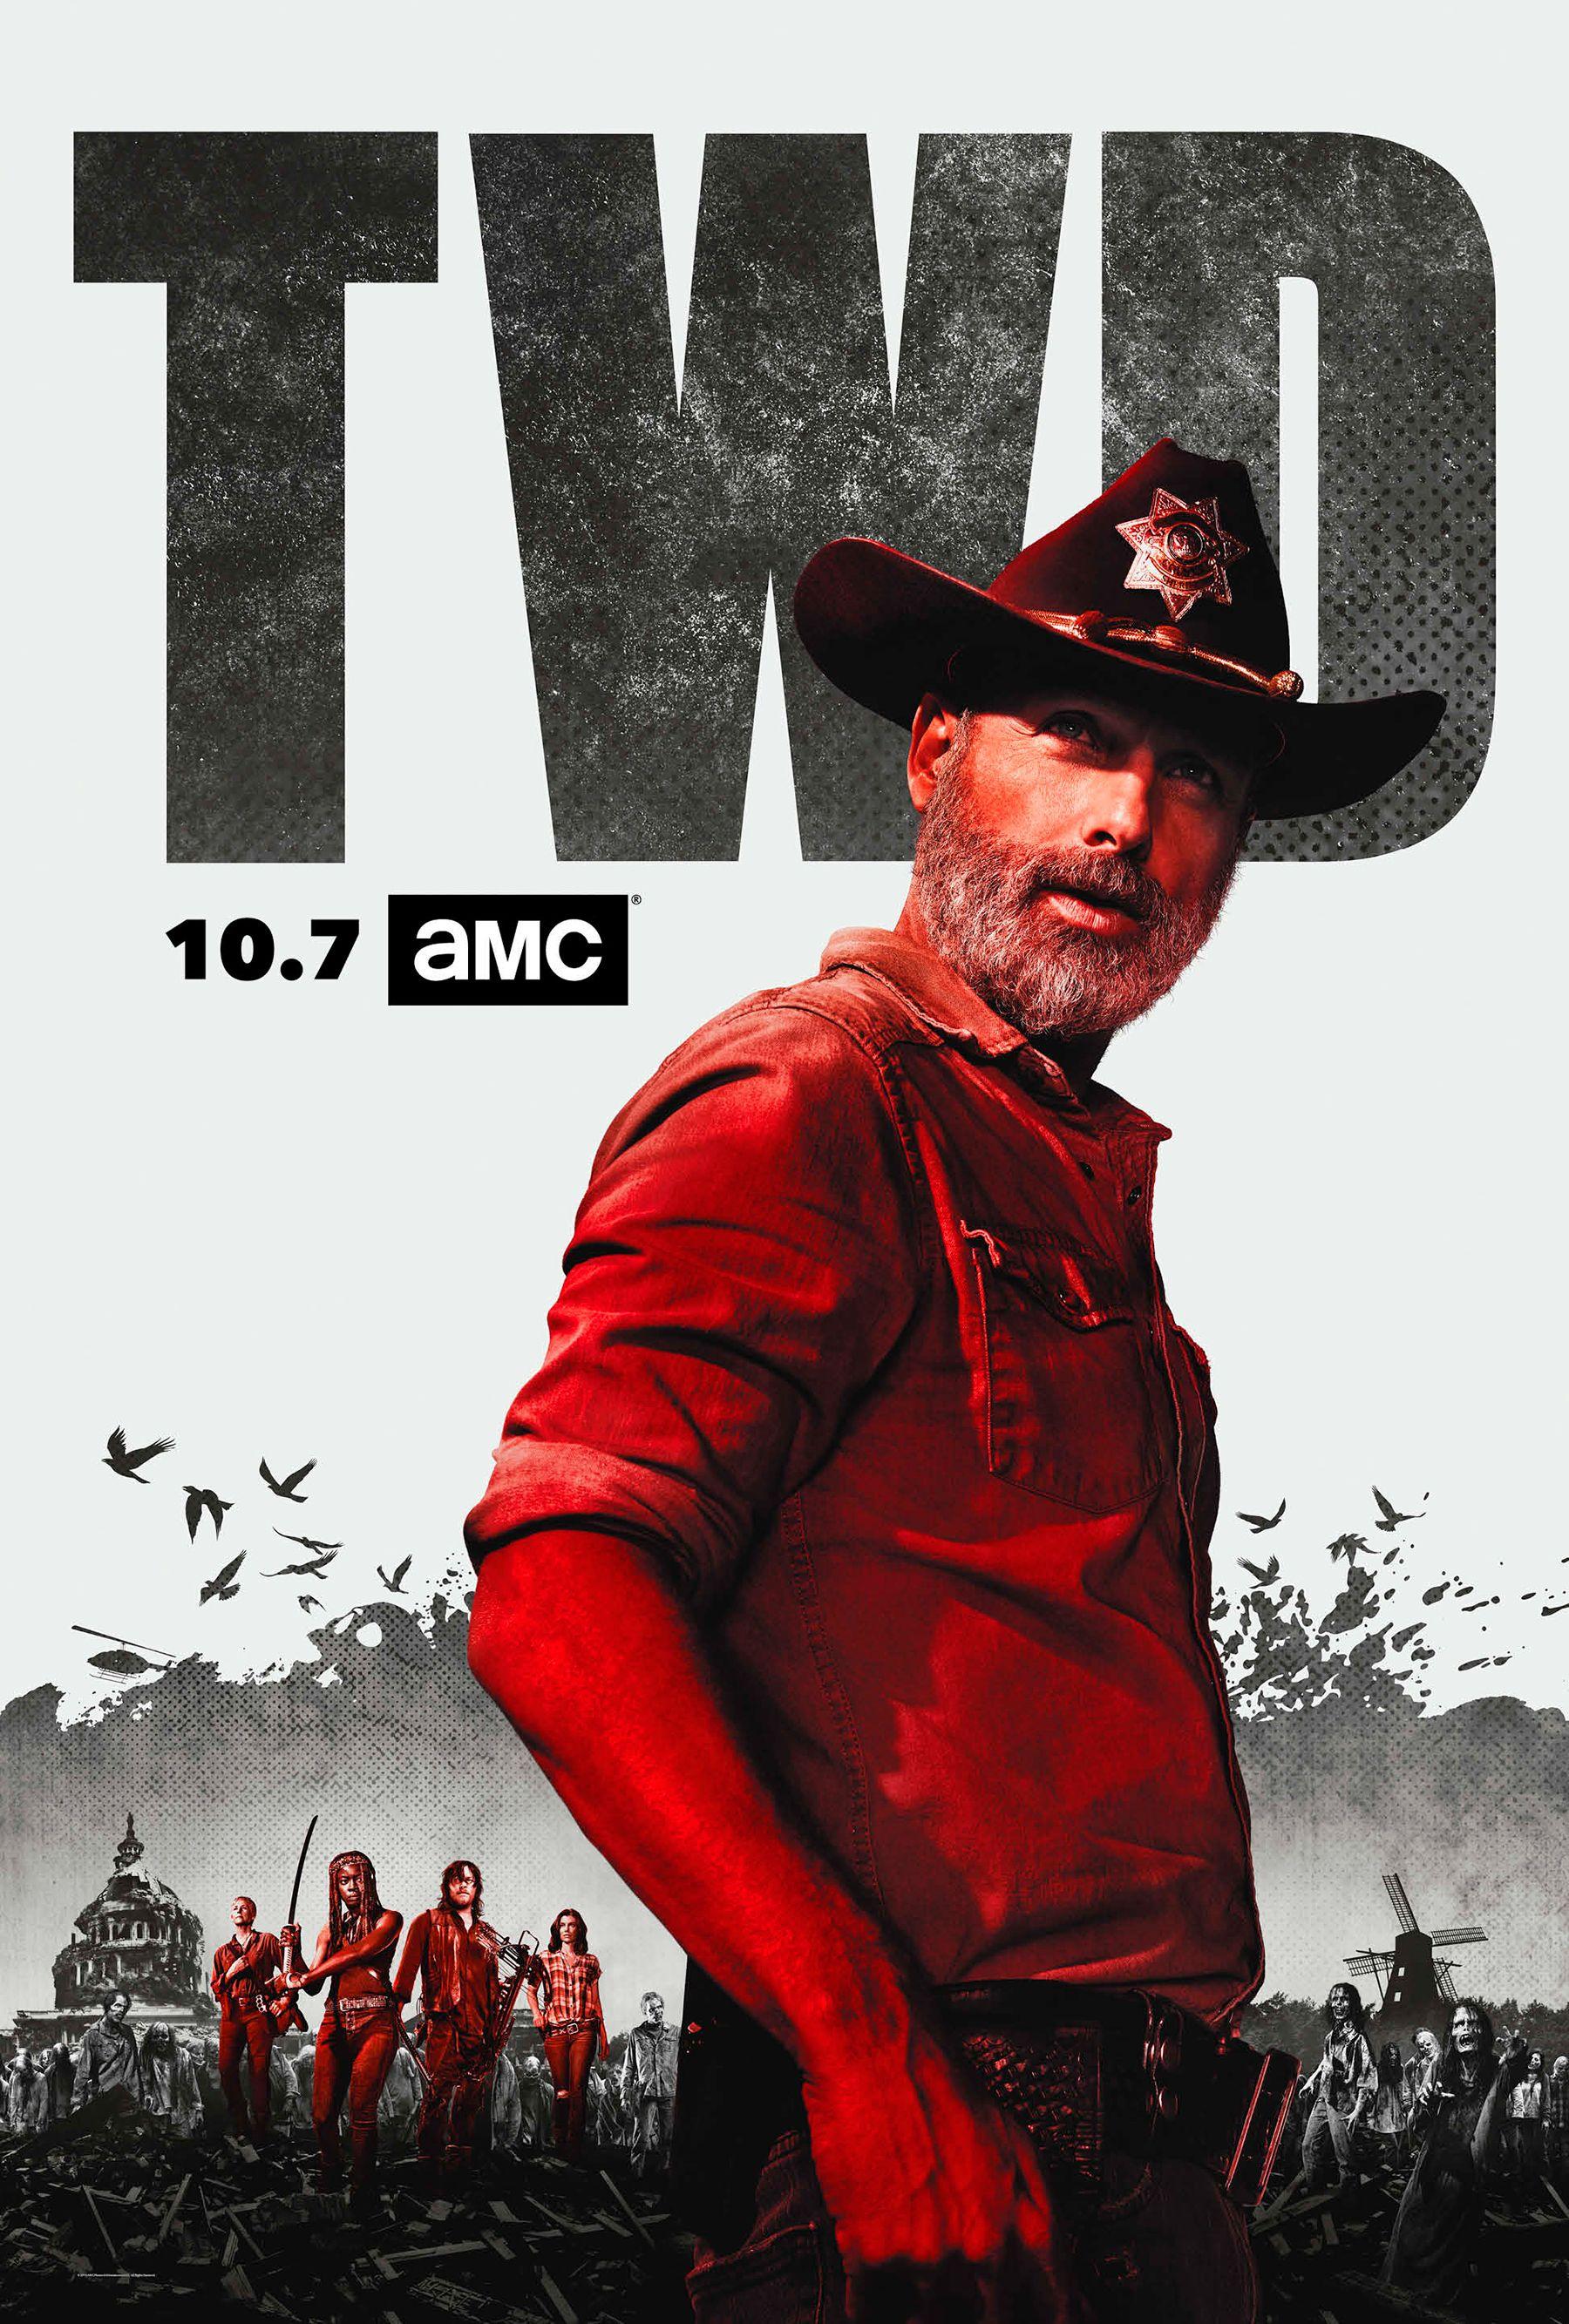 See Walking Dead Stars Andrew Lincoln Danai Gurira More In New